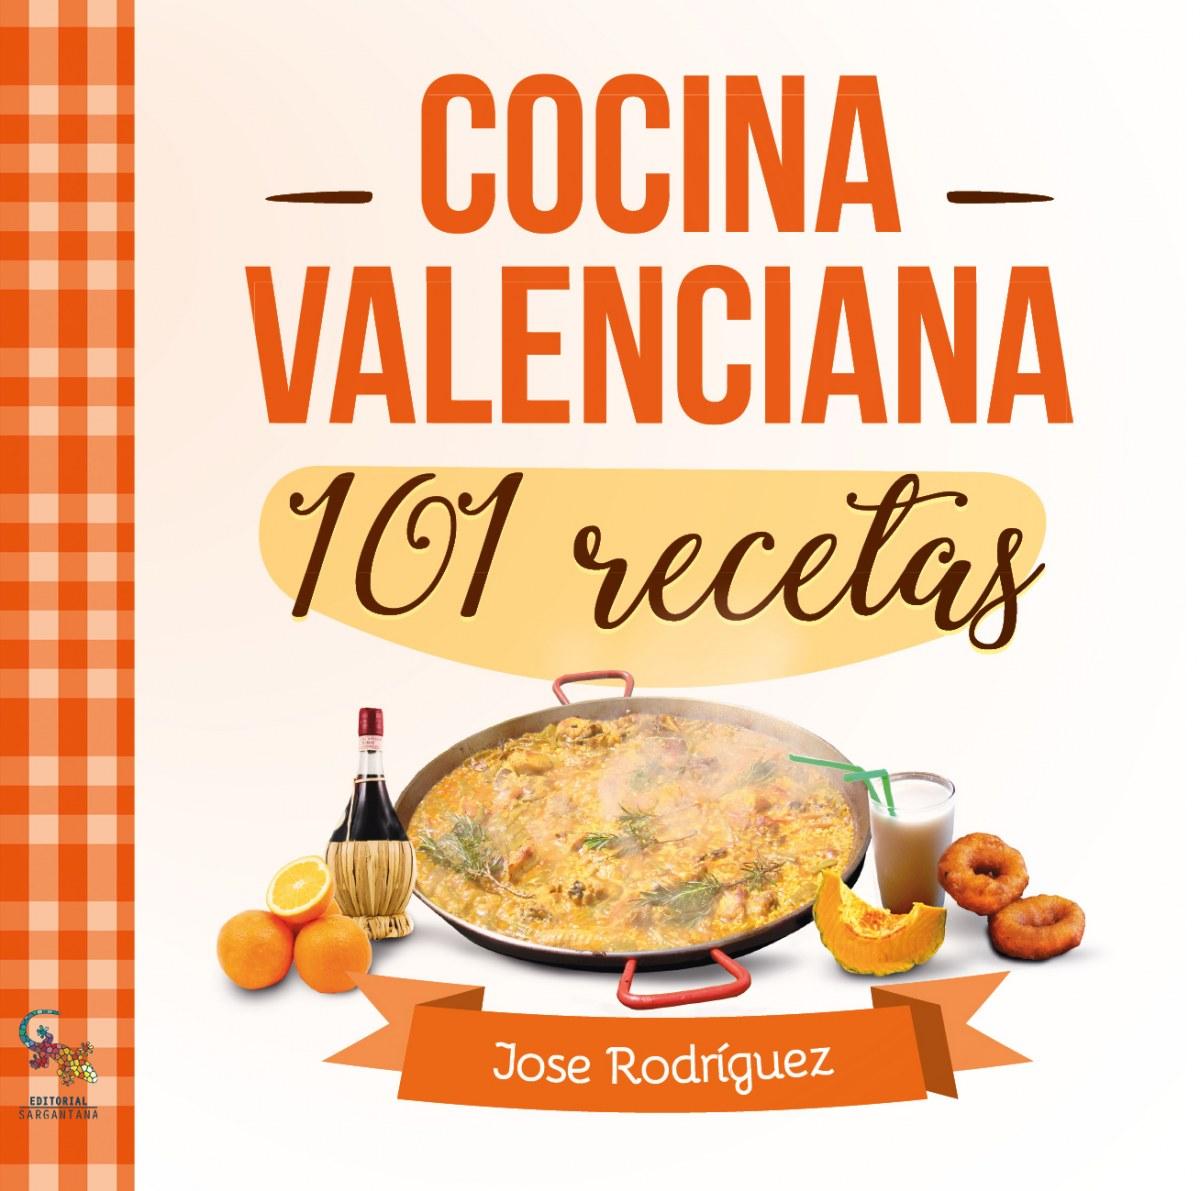 Cocina valenciana 101 recetas 9788416900602